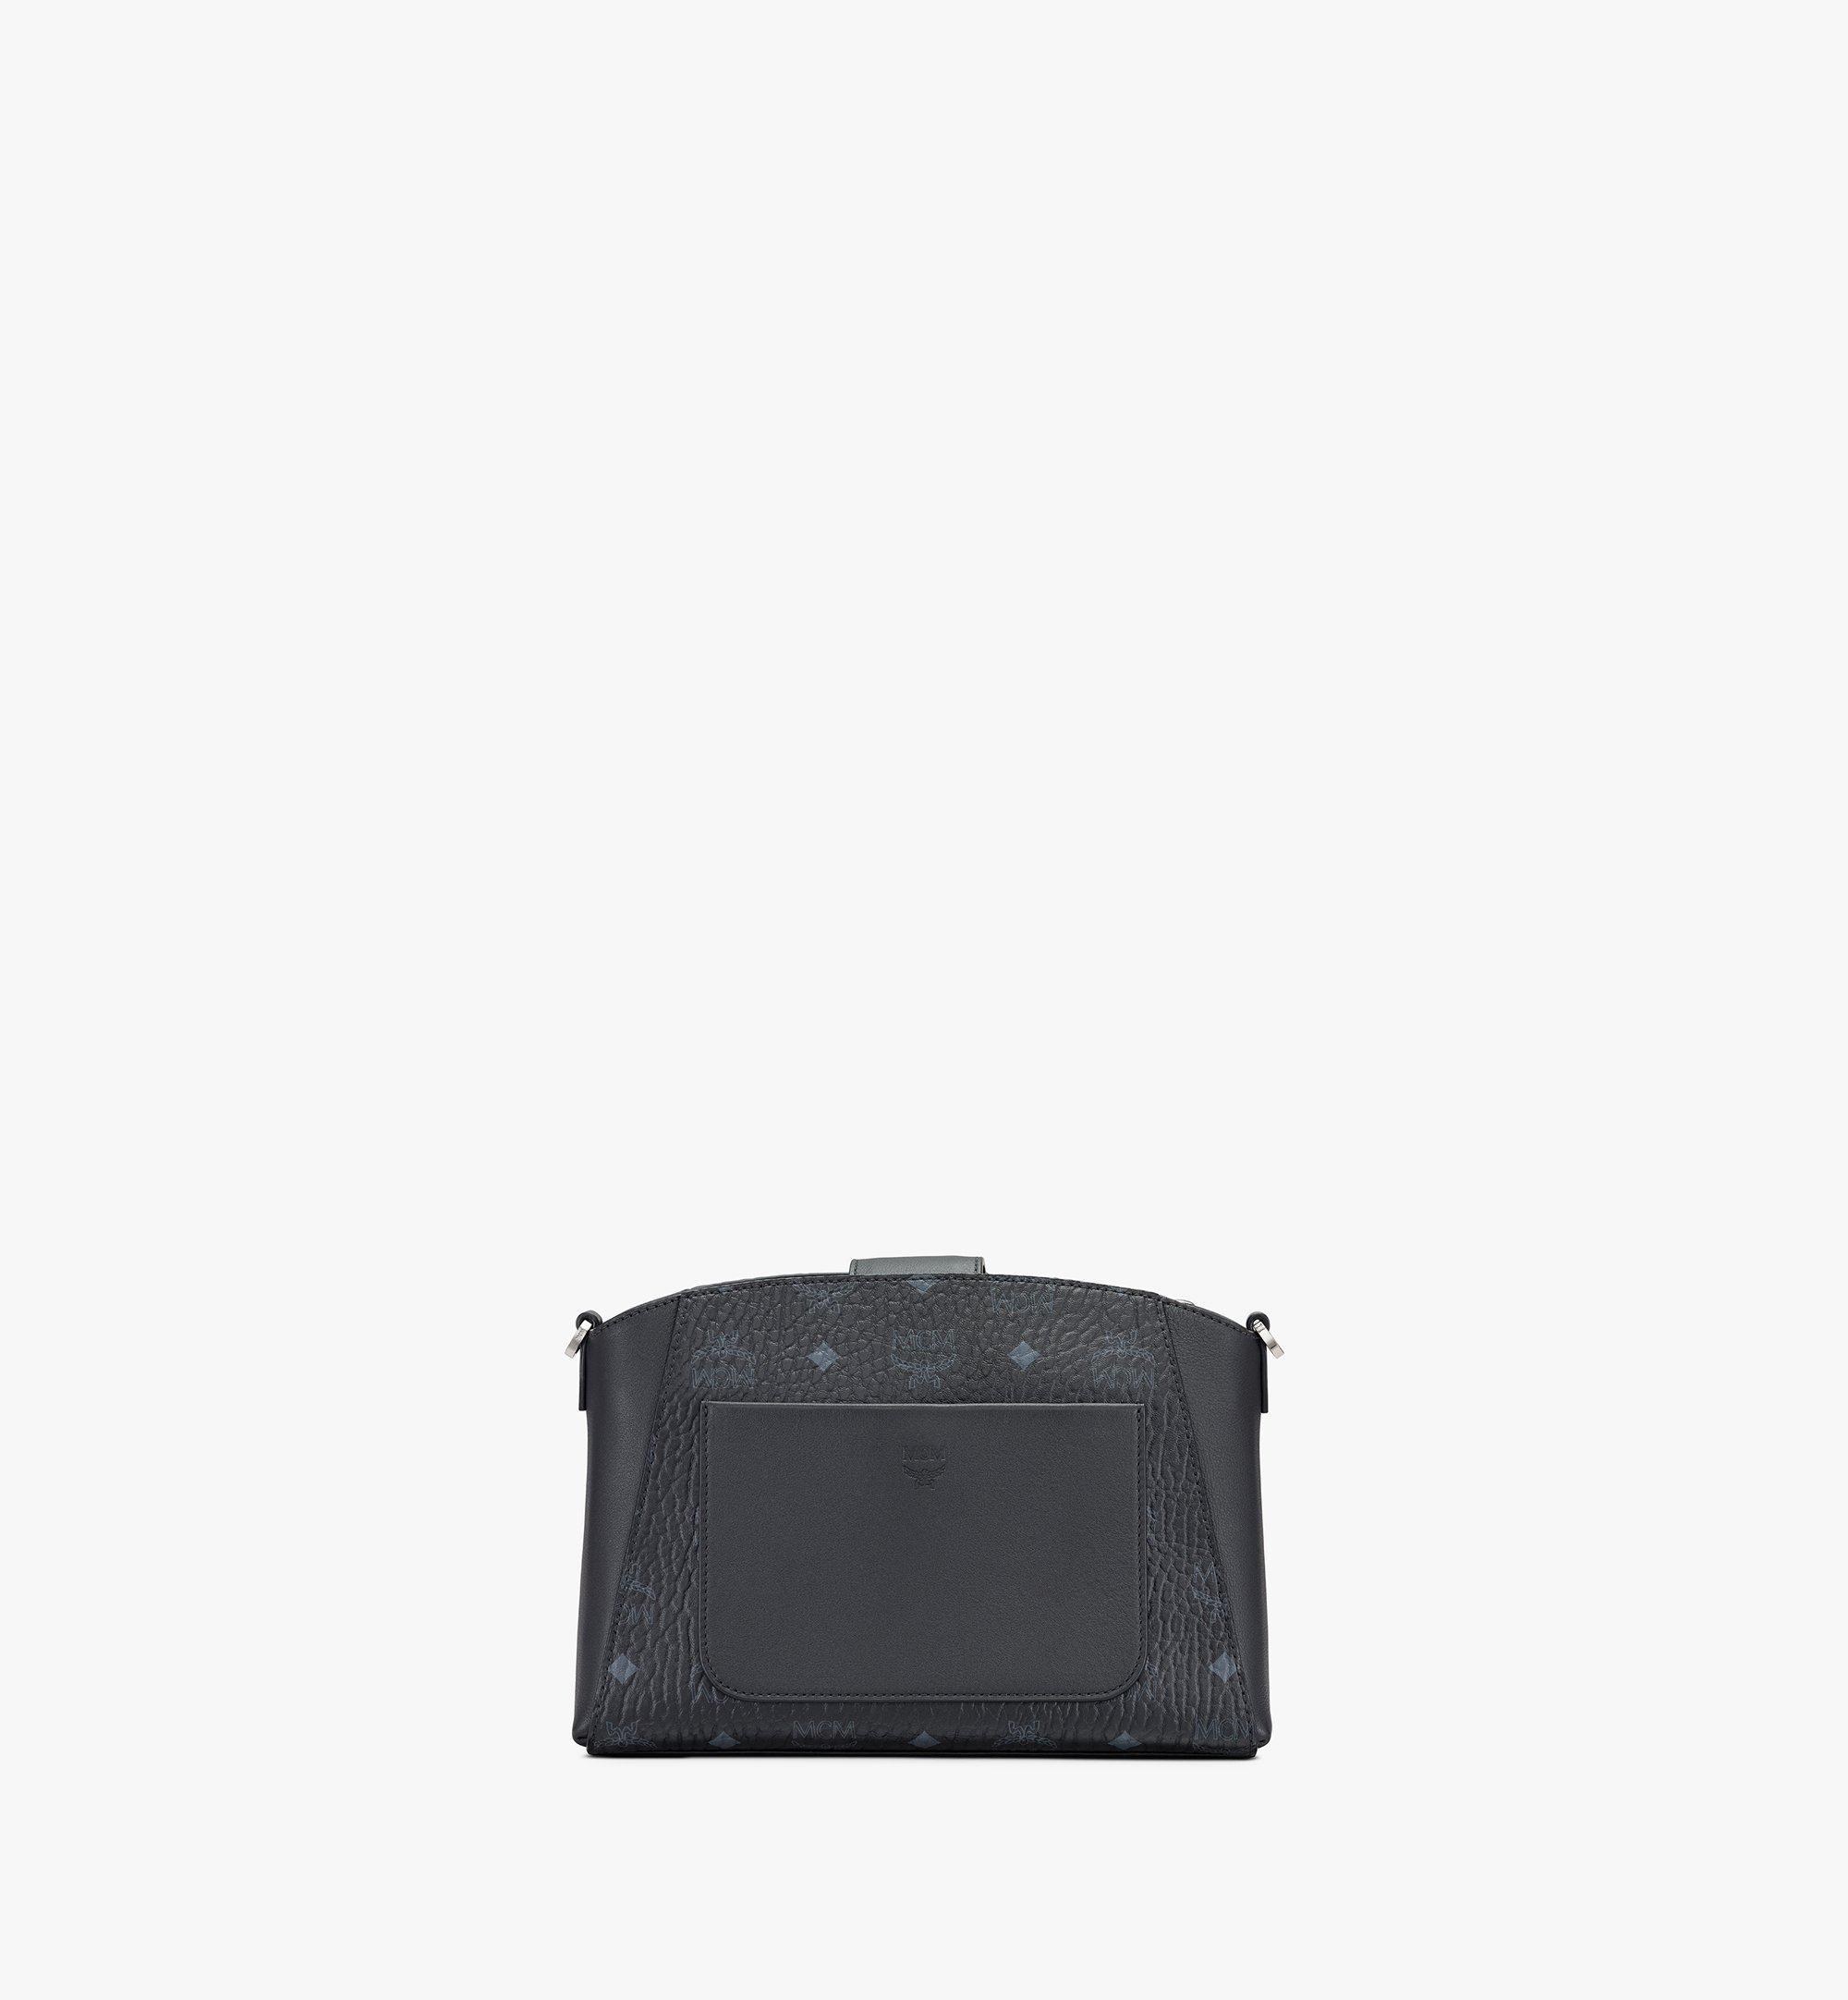 MCM Essential Crossbody Bag in Visetos Original Black MWRASSE07BK001 Alternate View 3